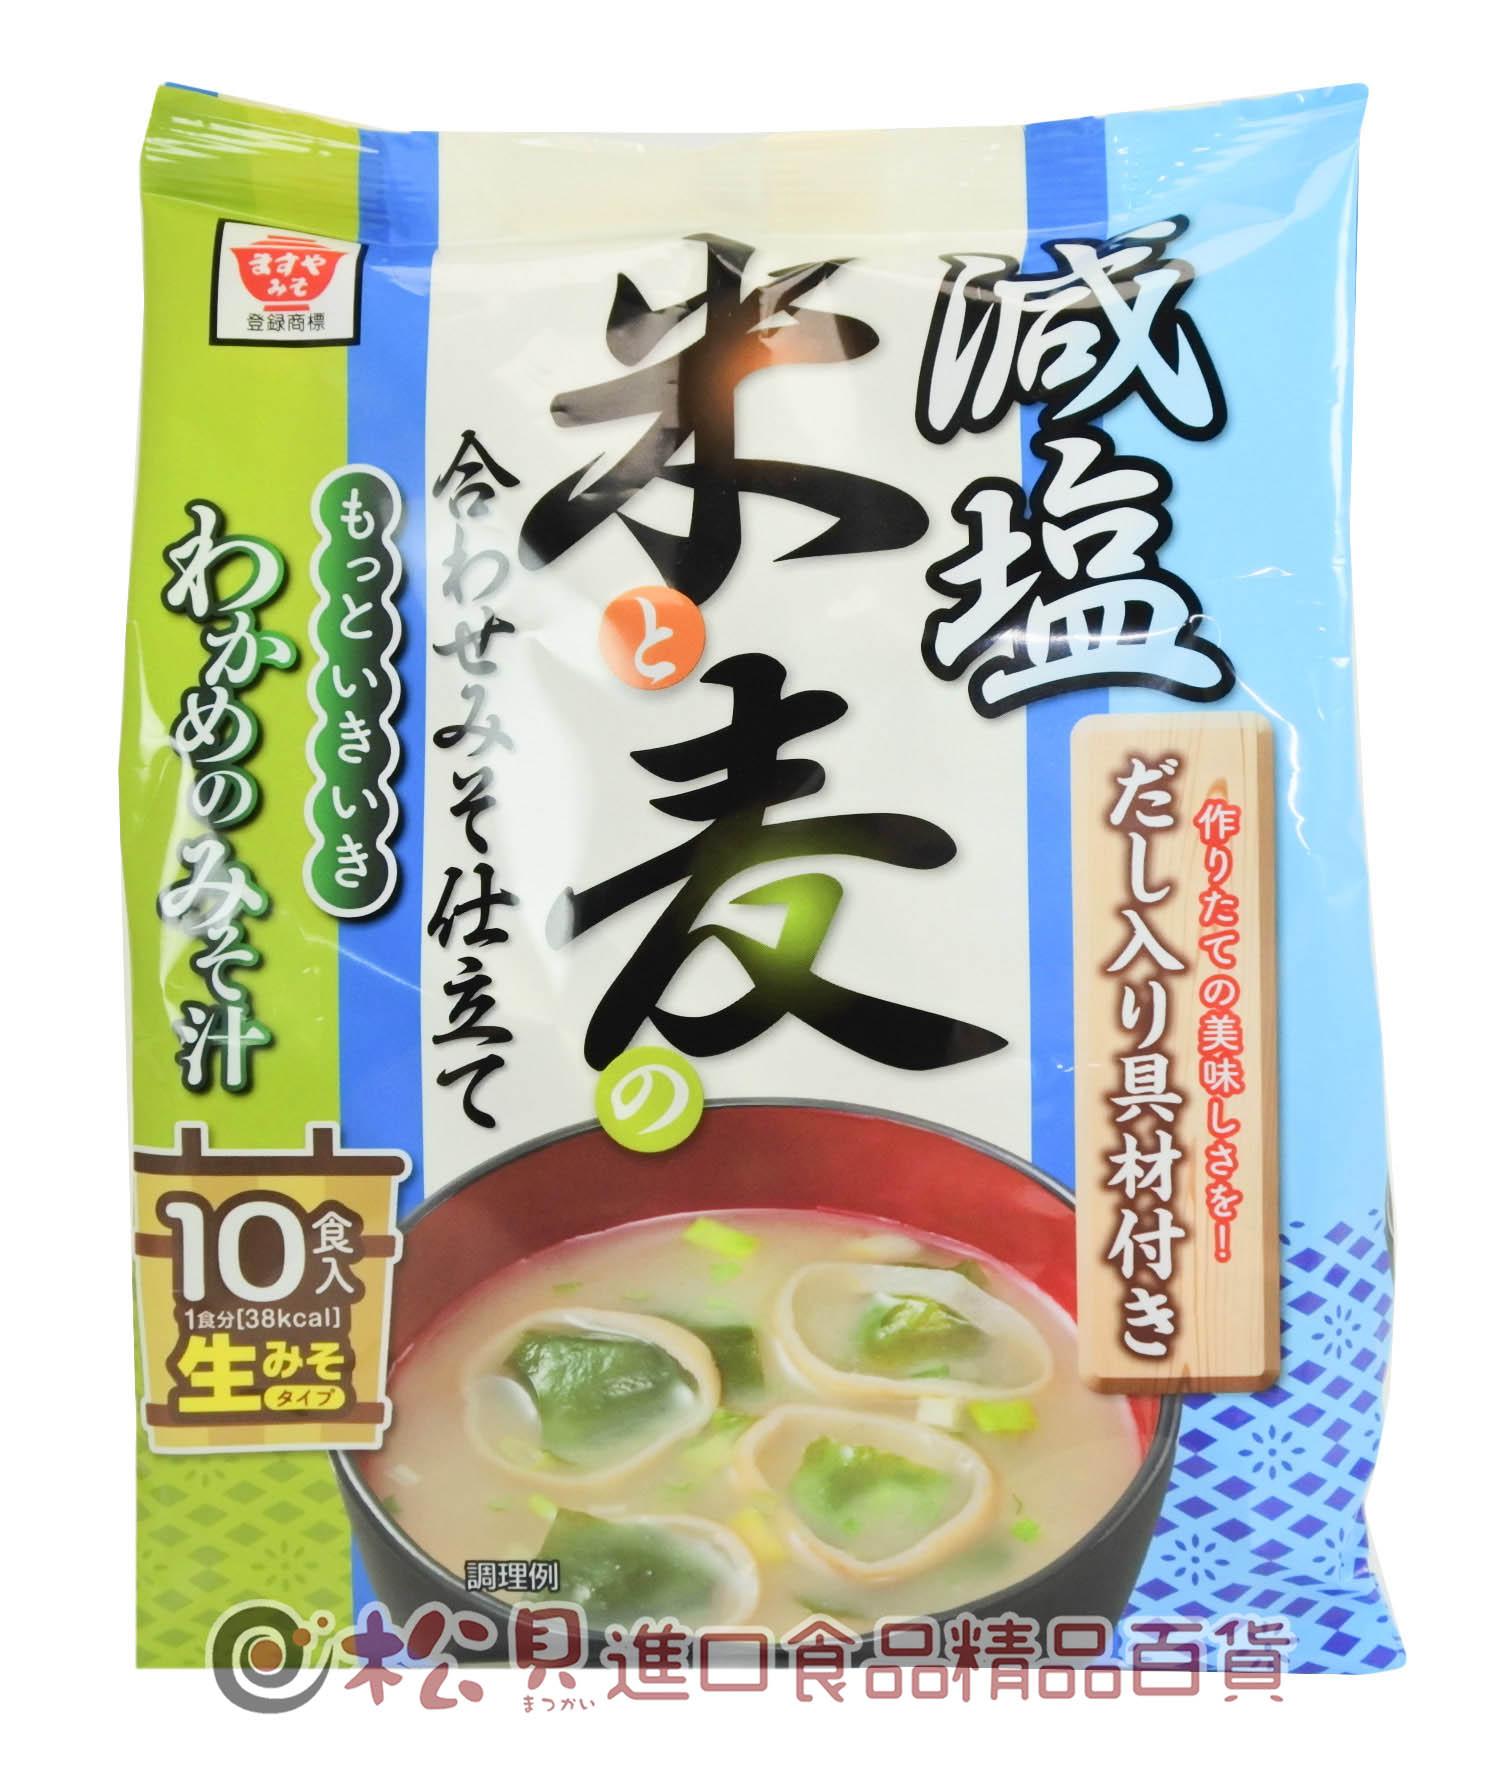 Masuya即席米麥減鹽味噌湯10食入204g【4902826232824】.jpg